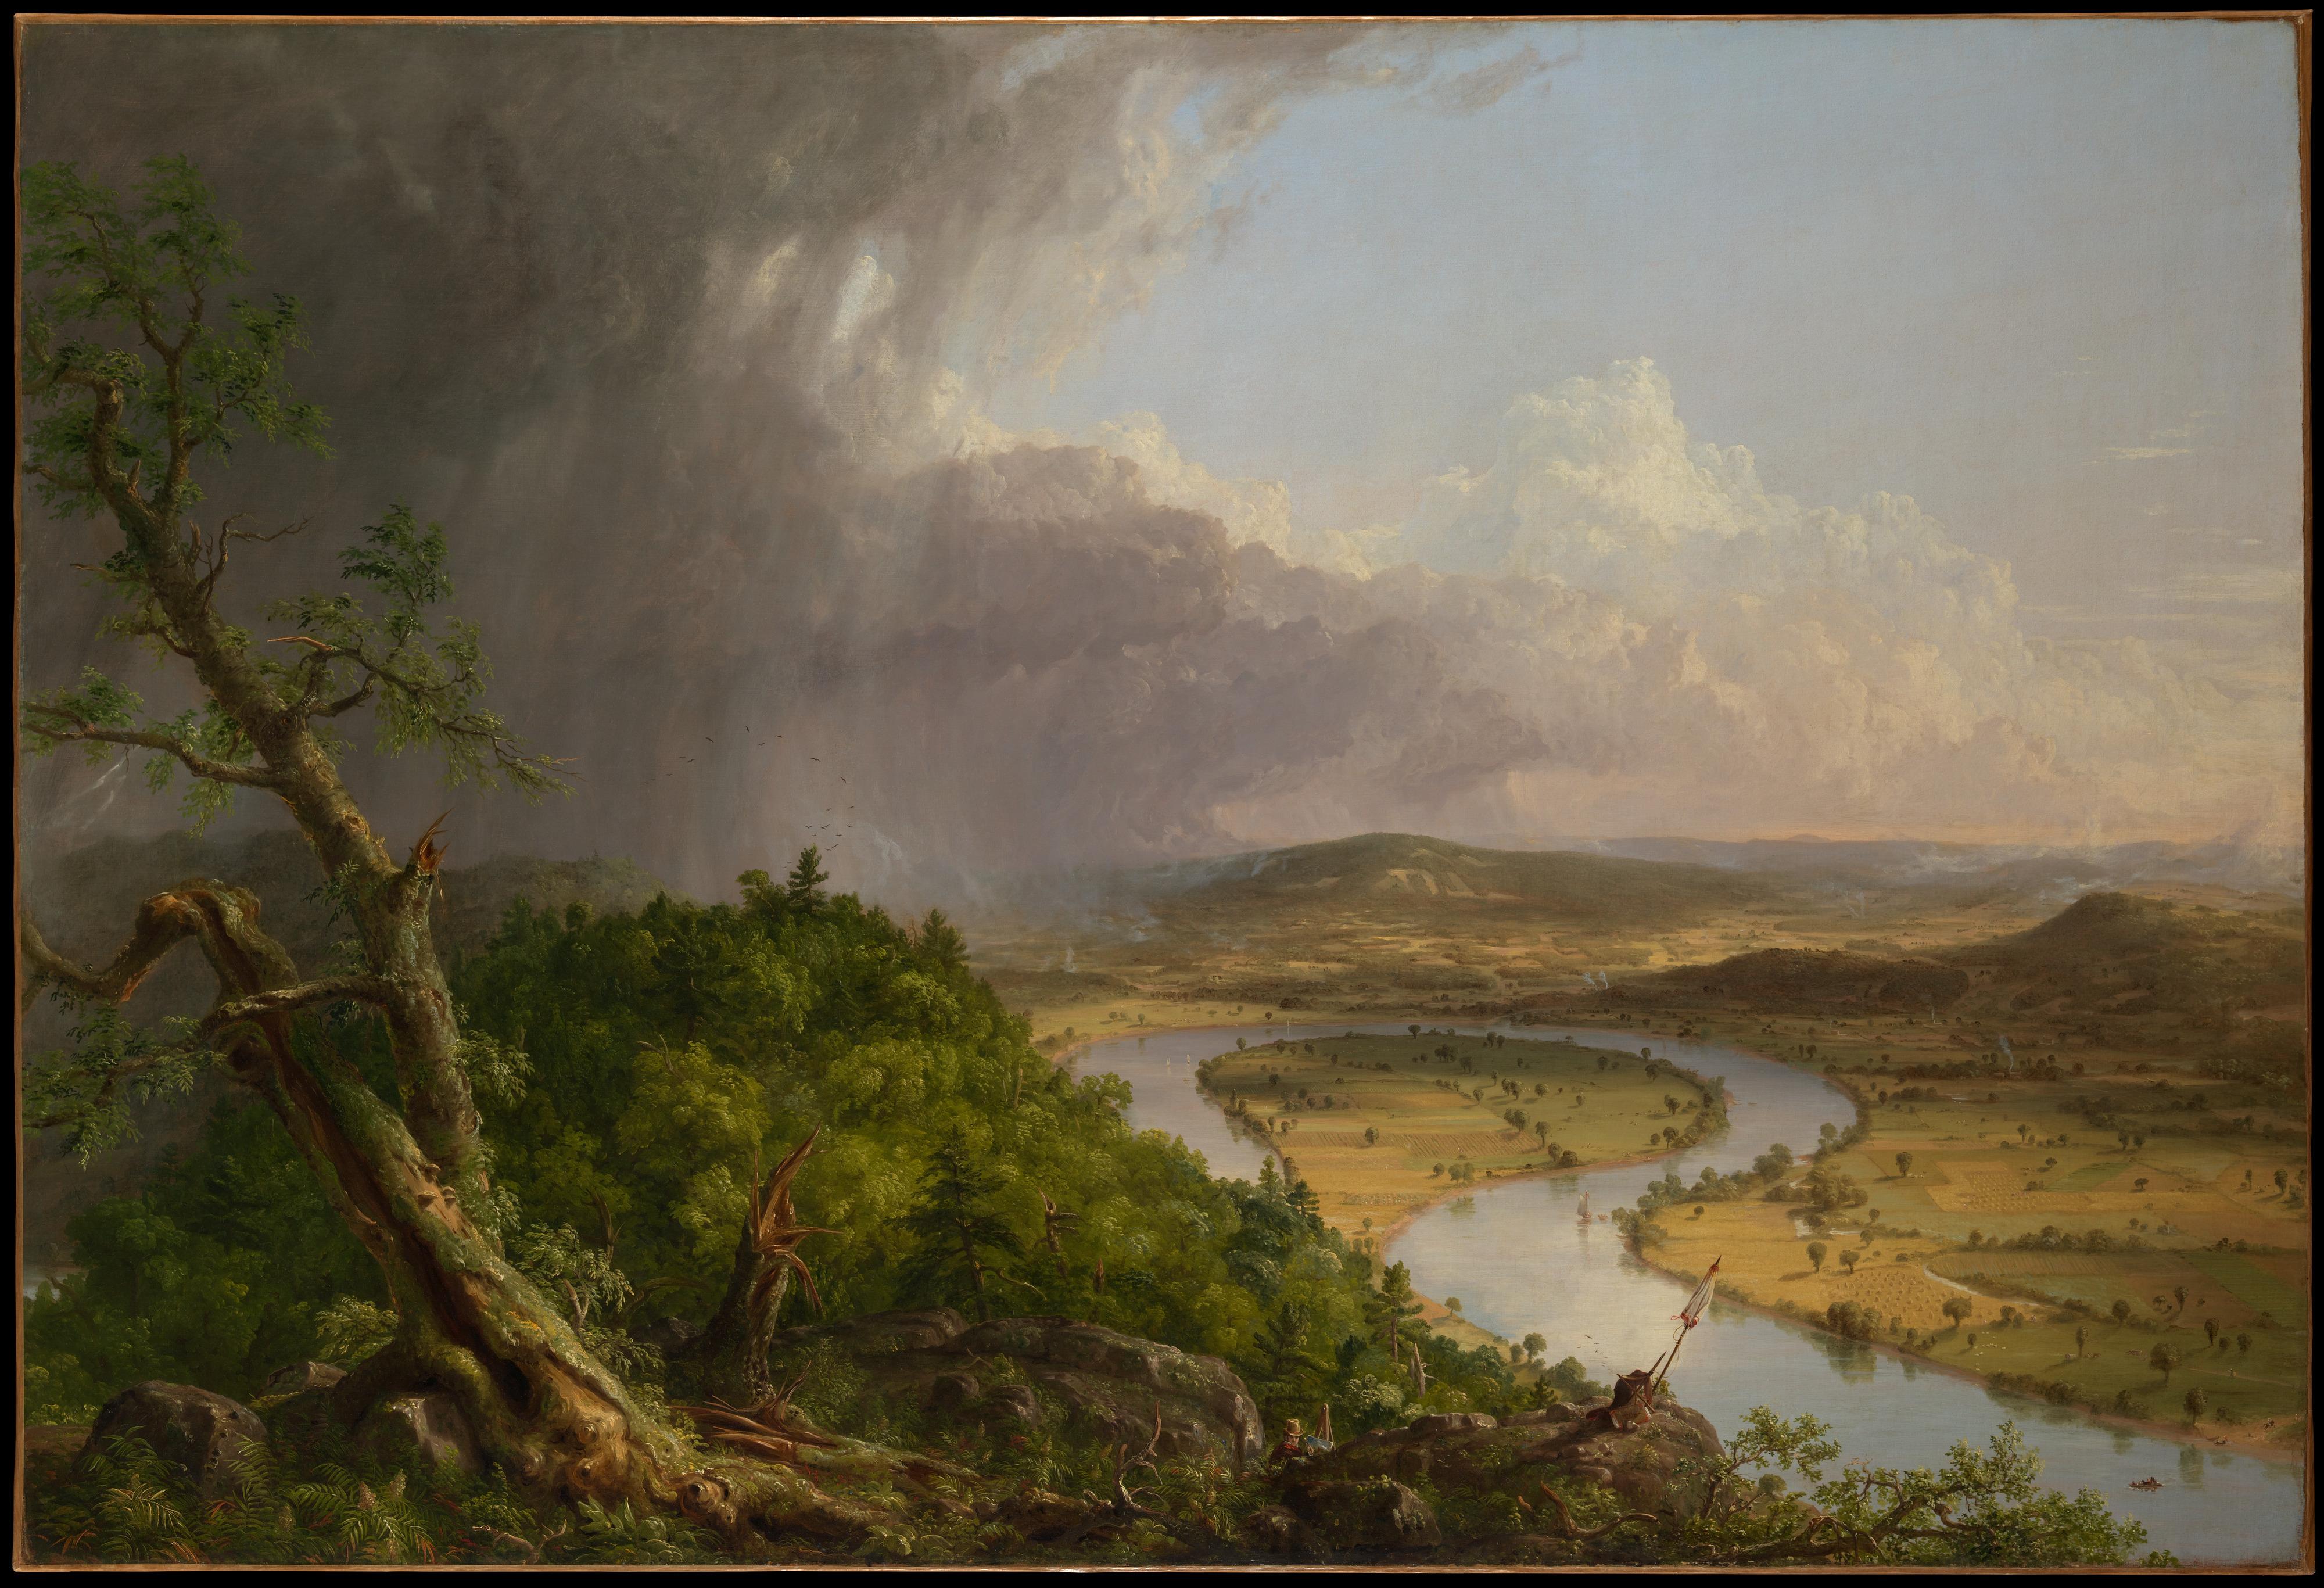 Cole 1836 Vue du mont Holyoke a Northampton, Massachusetts, apres l'orage — The Oxbow MET